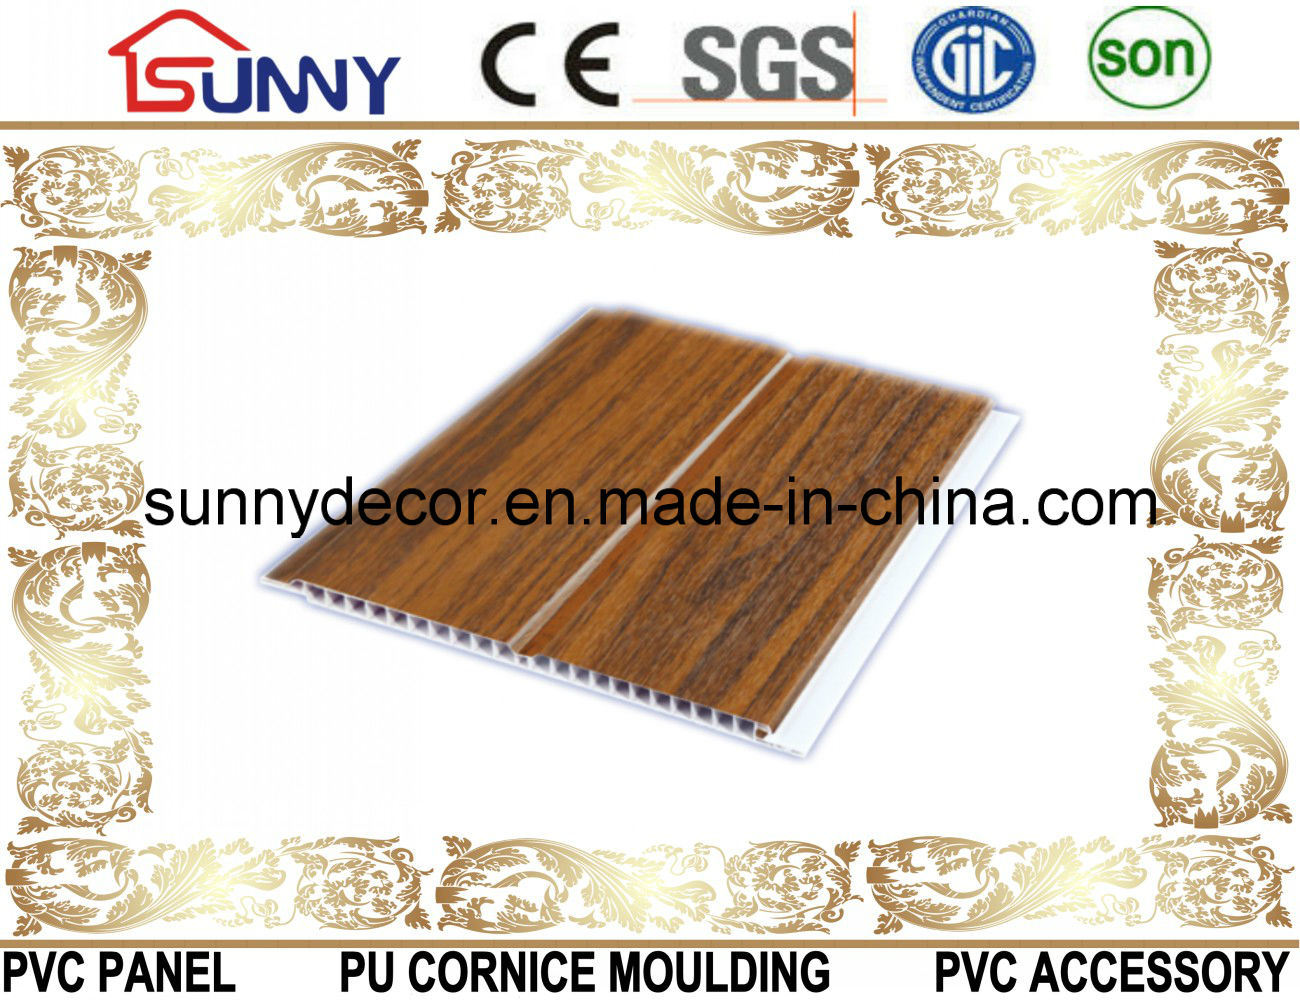 Lamination Groove PVC Ceiling Panel, PVC Wall Panel, PVC Ceiling Tile